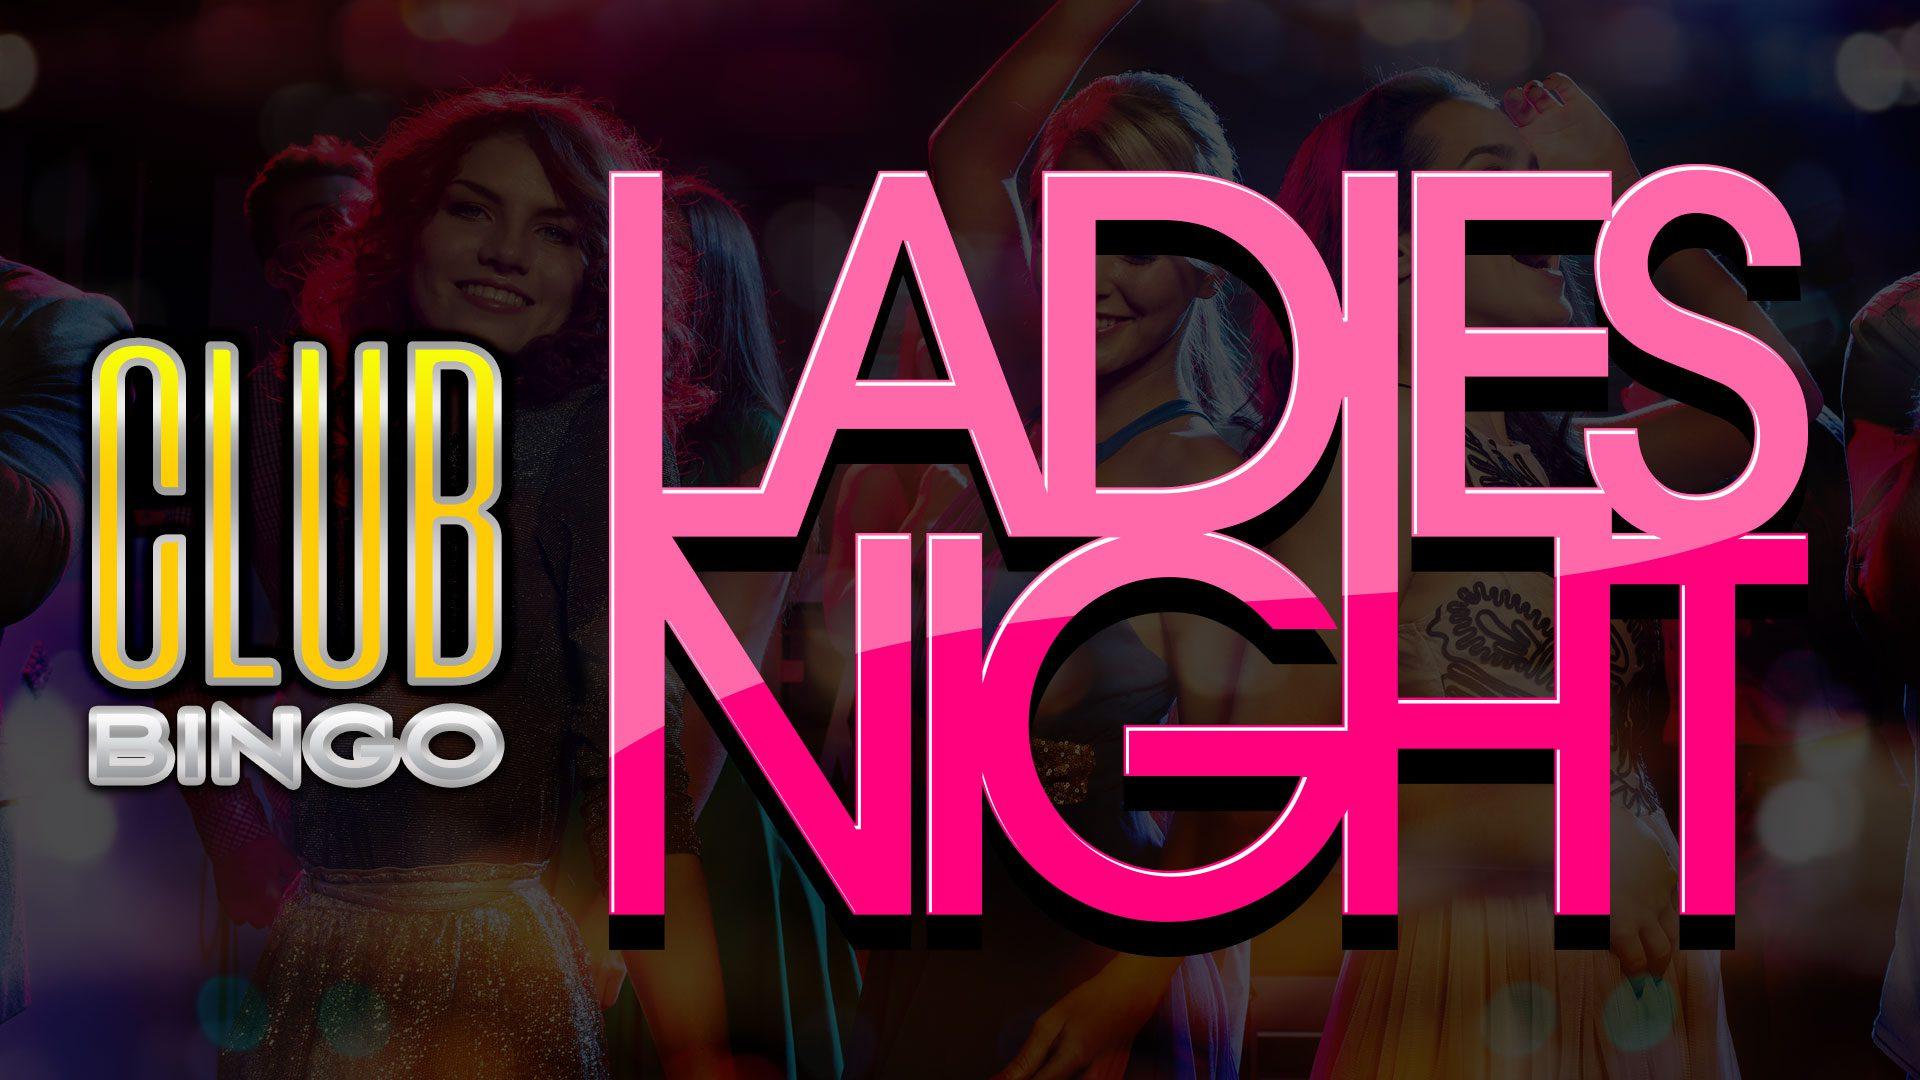 club bingo ladies-night